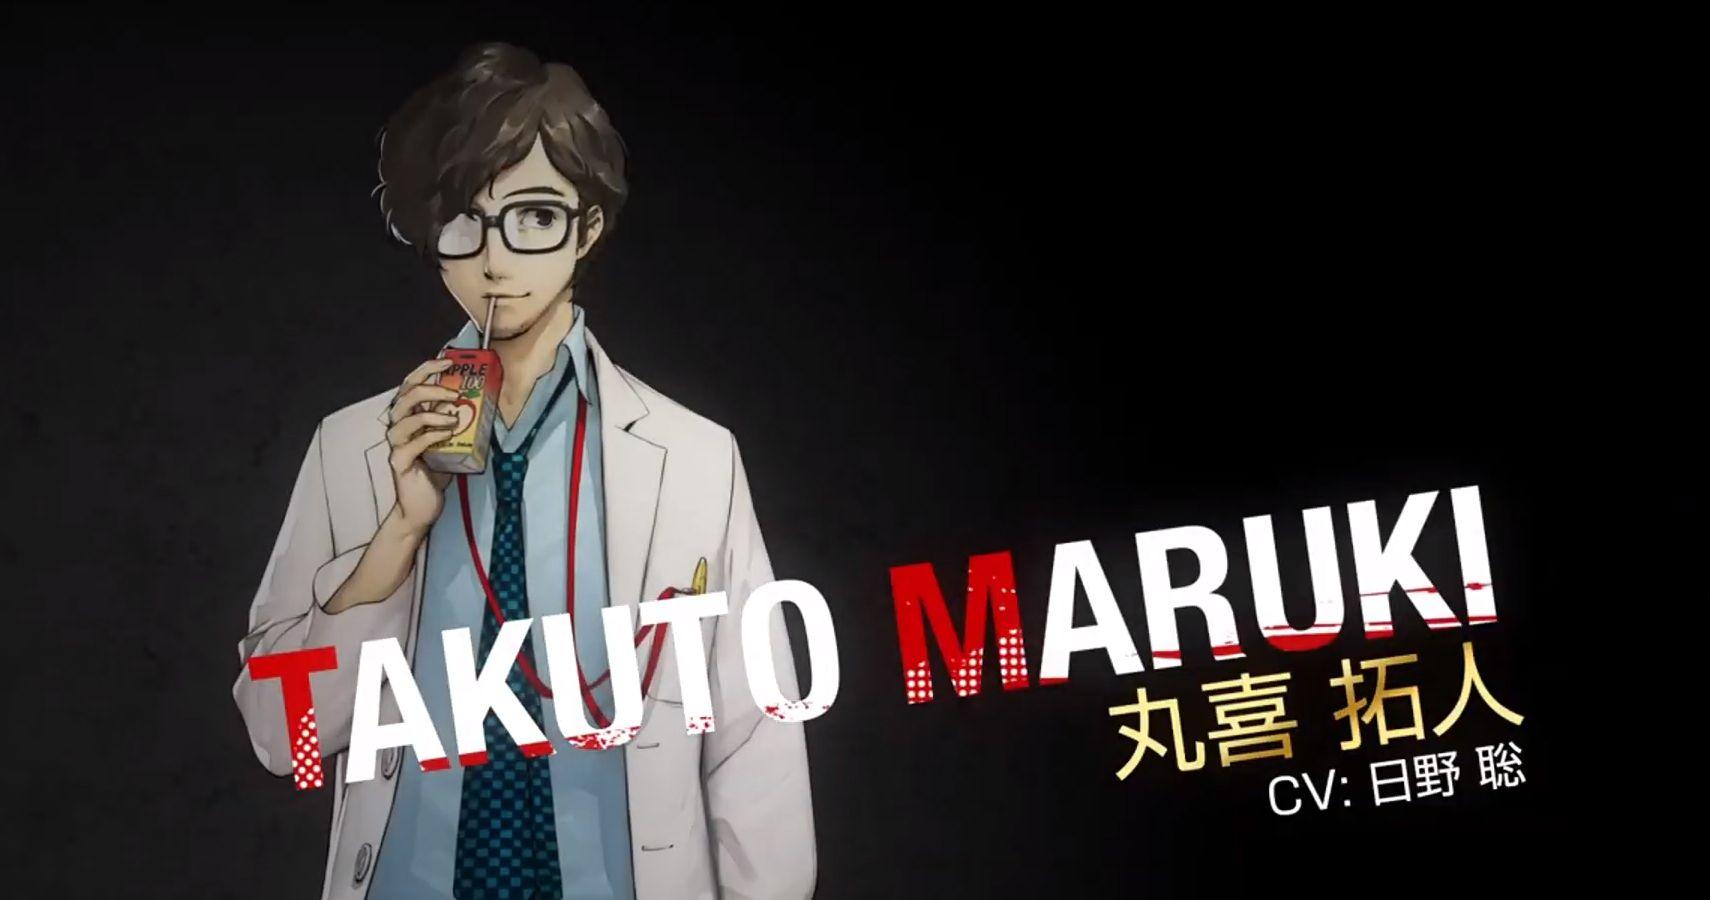 Persona 5 Releases Character Trailer For Salt Bae Takuto Maruki